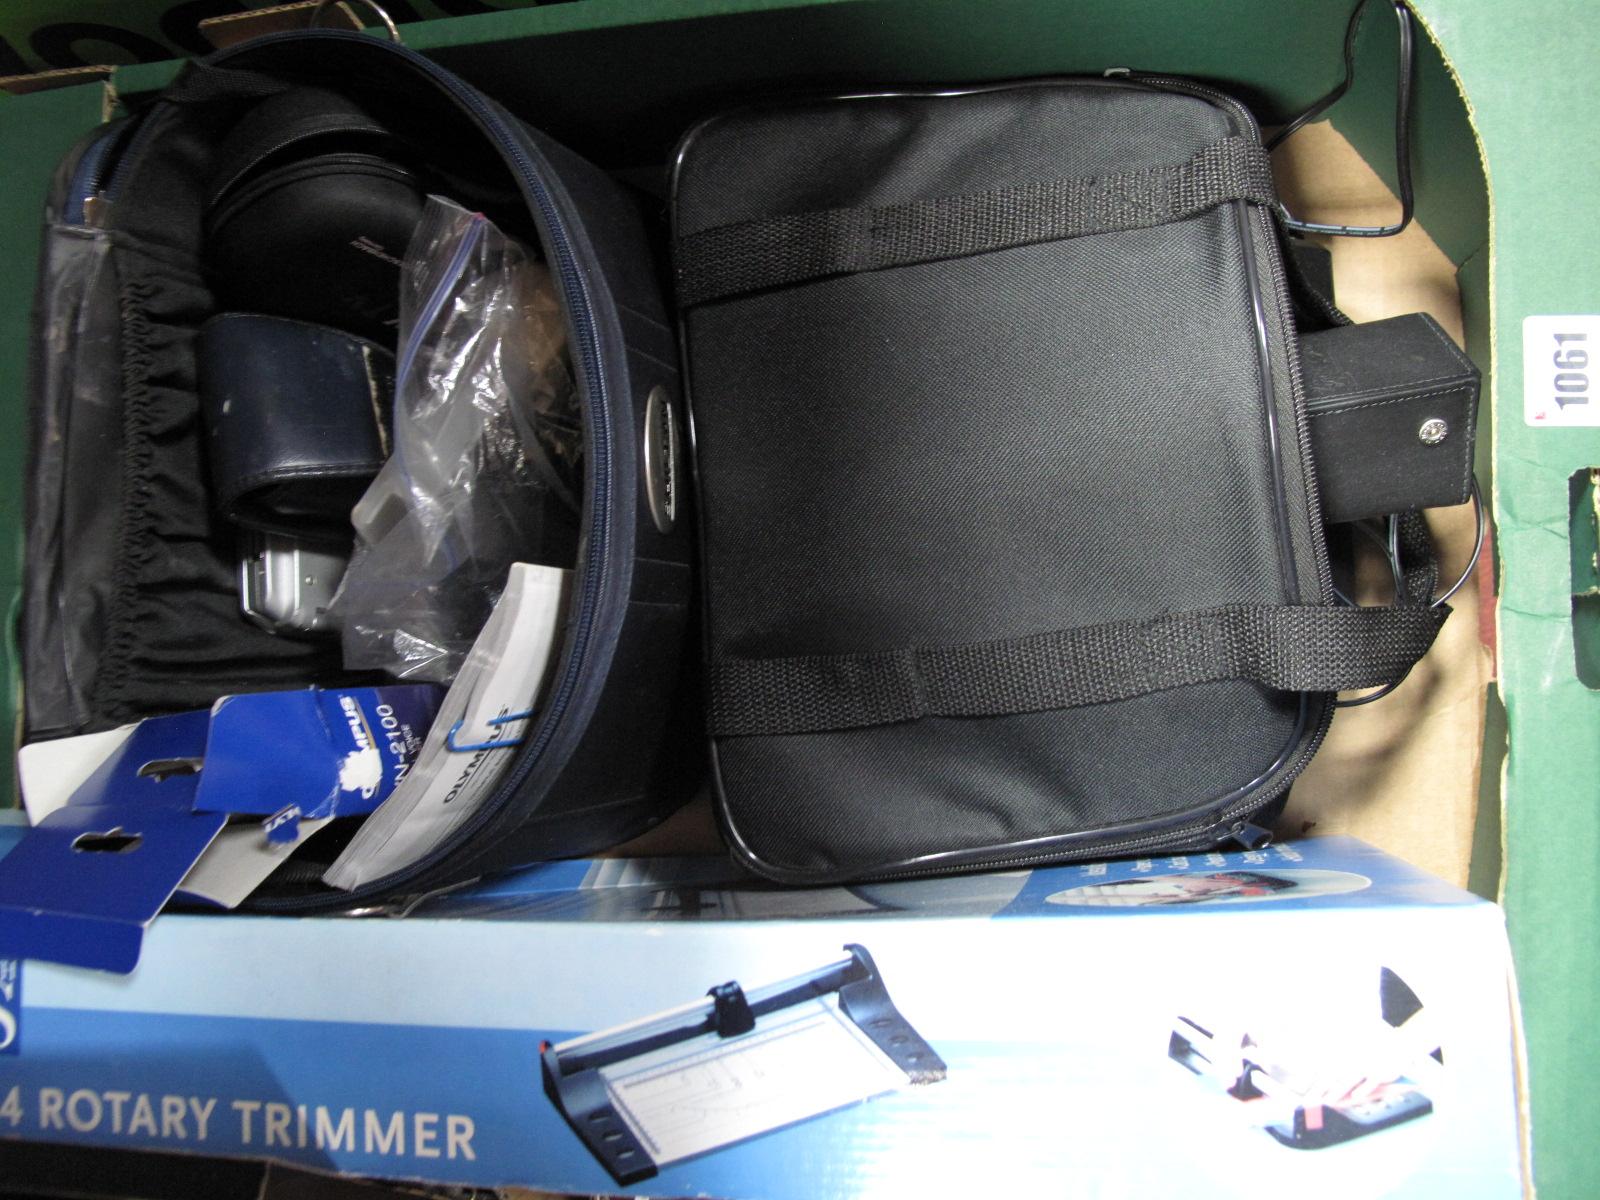 Lot 1061 - A Proline DVD Video Player, Olympus camera, binoculars, etc.